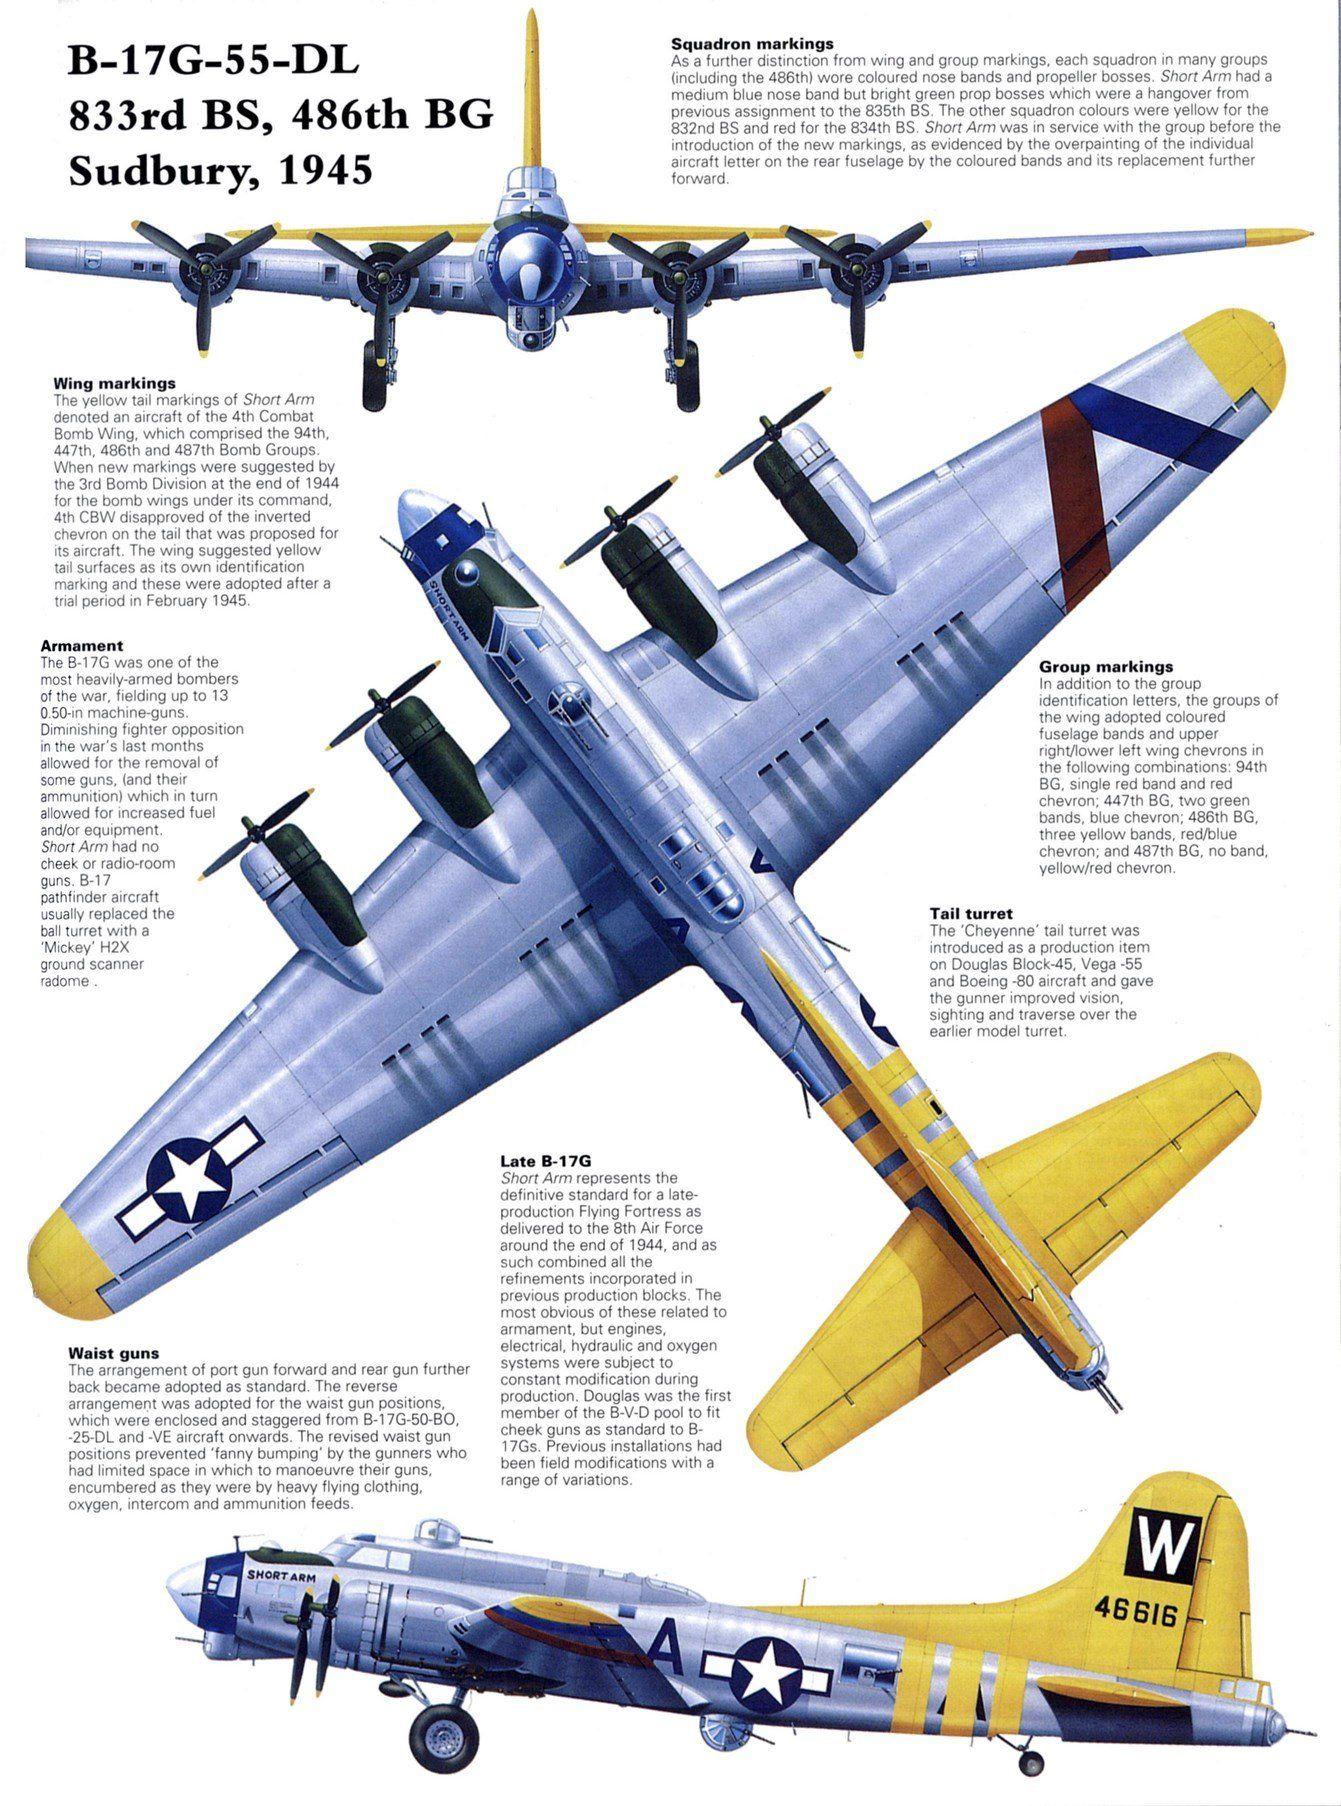 833rd aero squadron - Aircraft